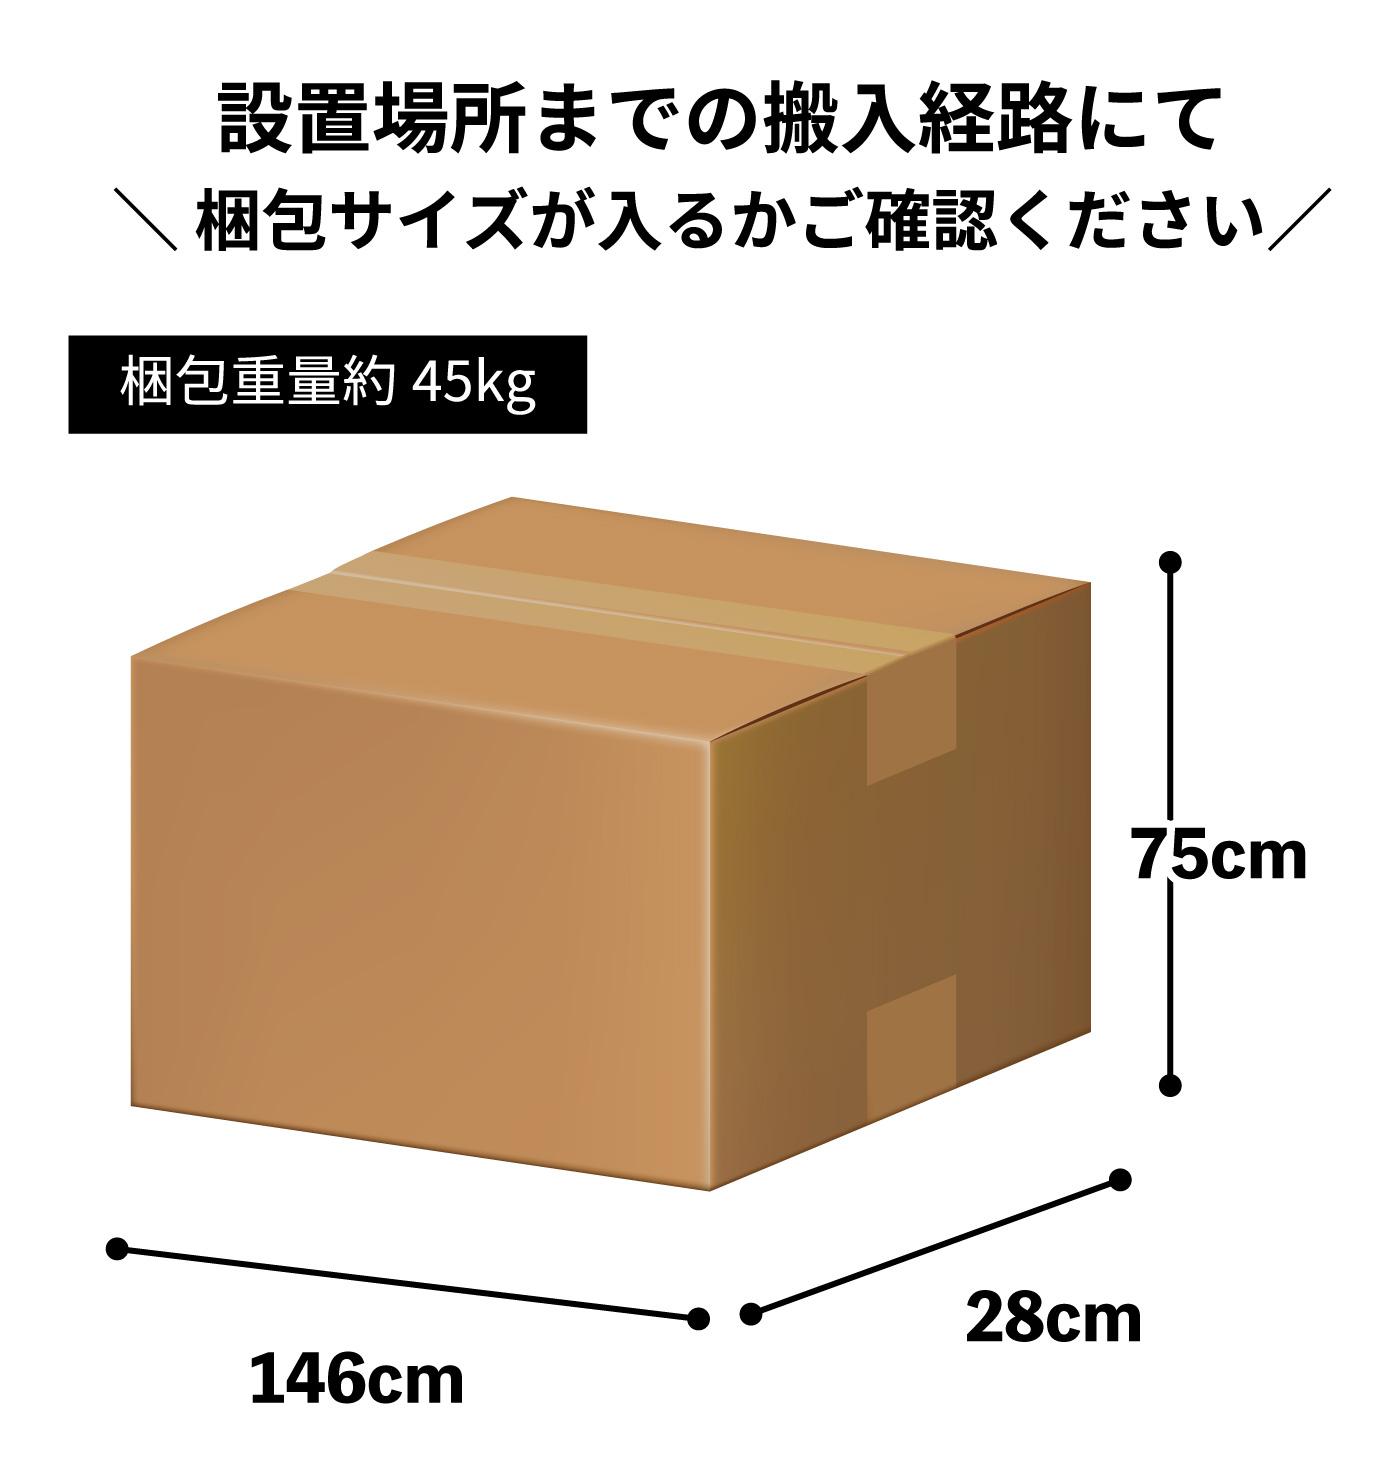 DK-1030Aの梱包サイズ